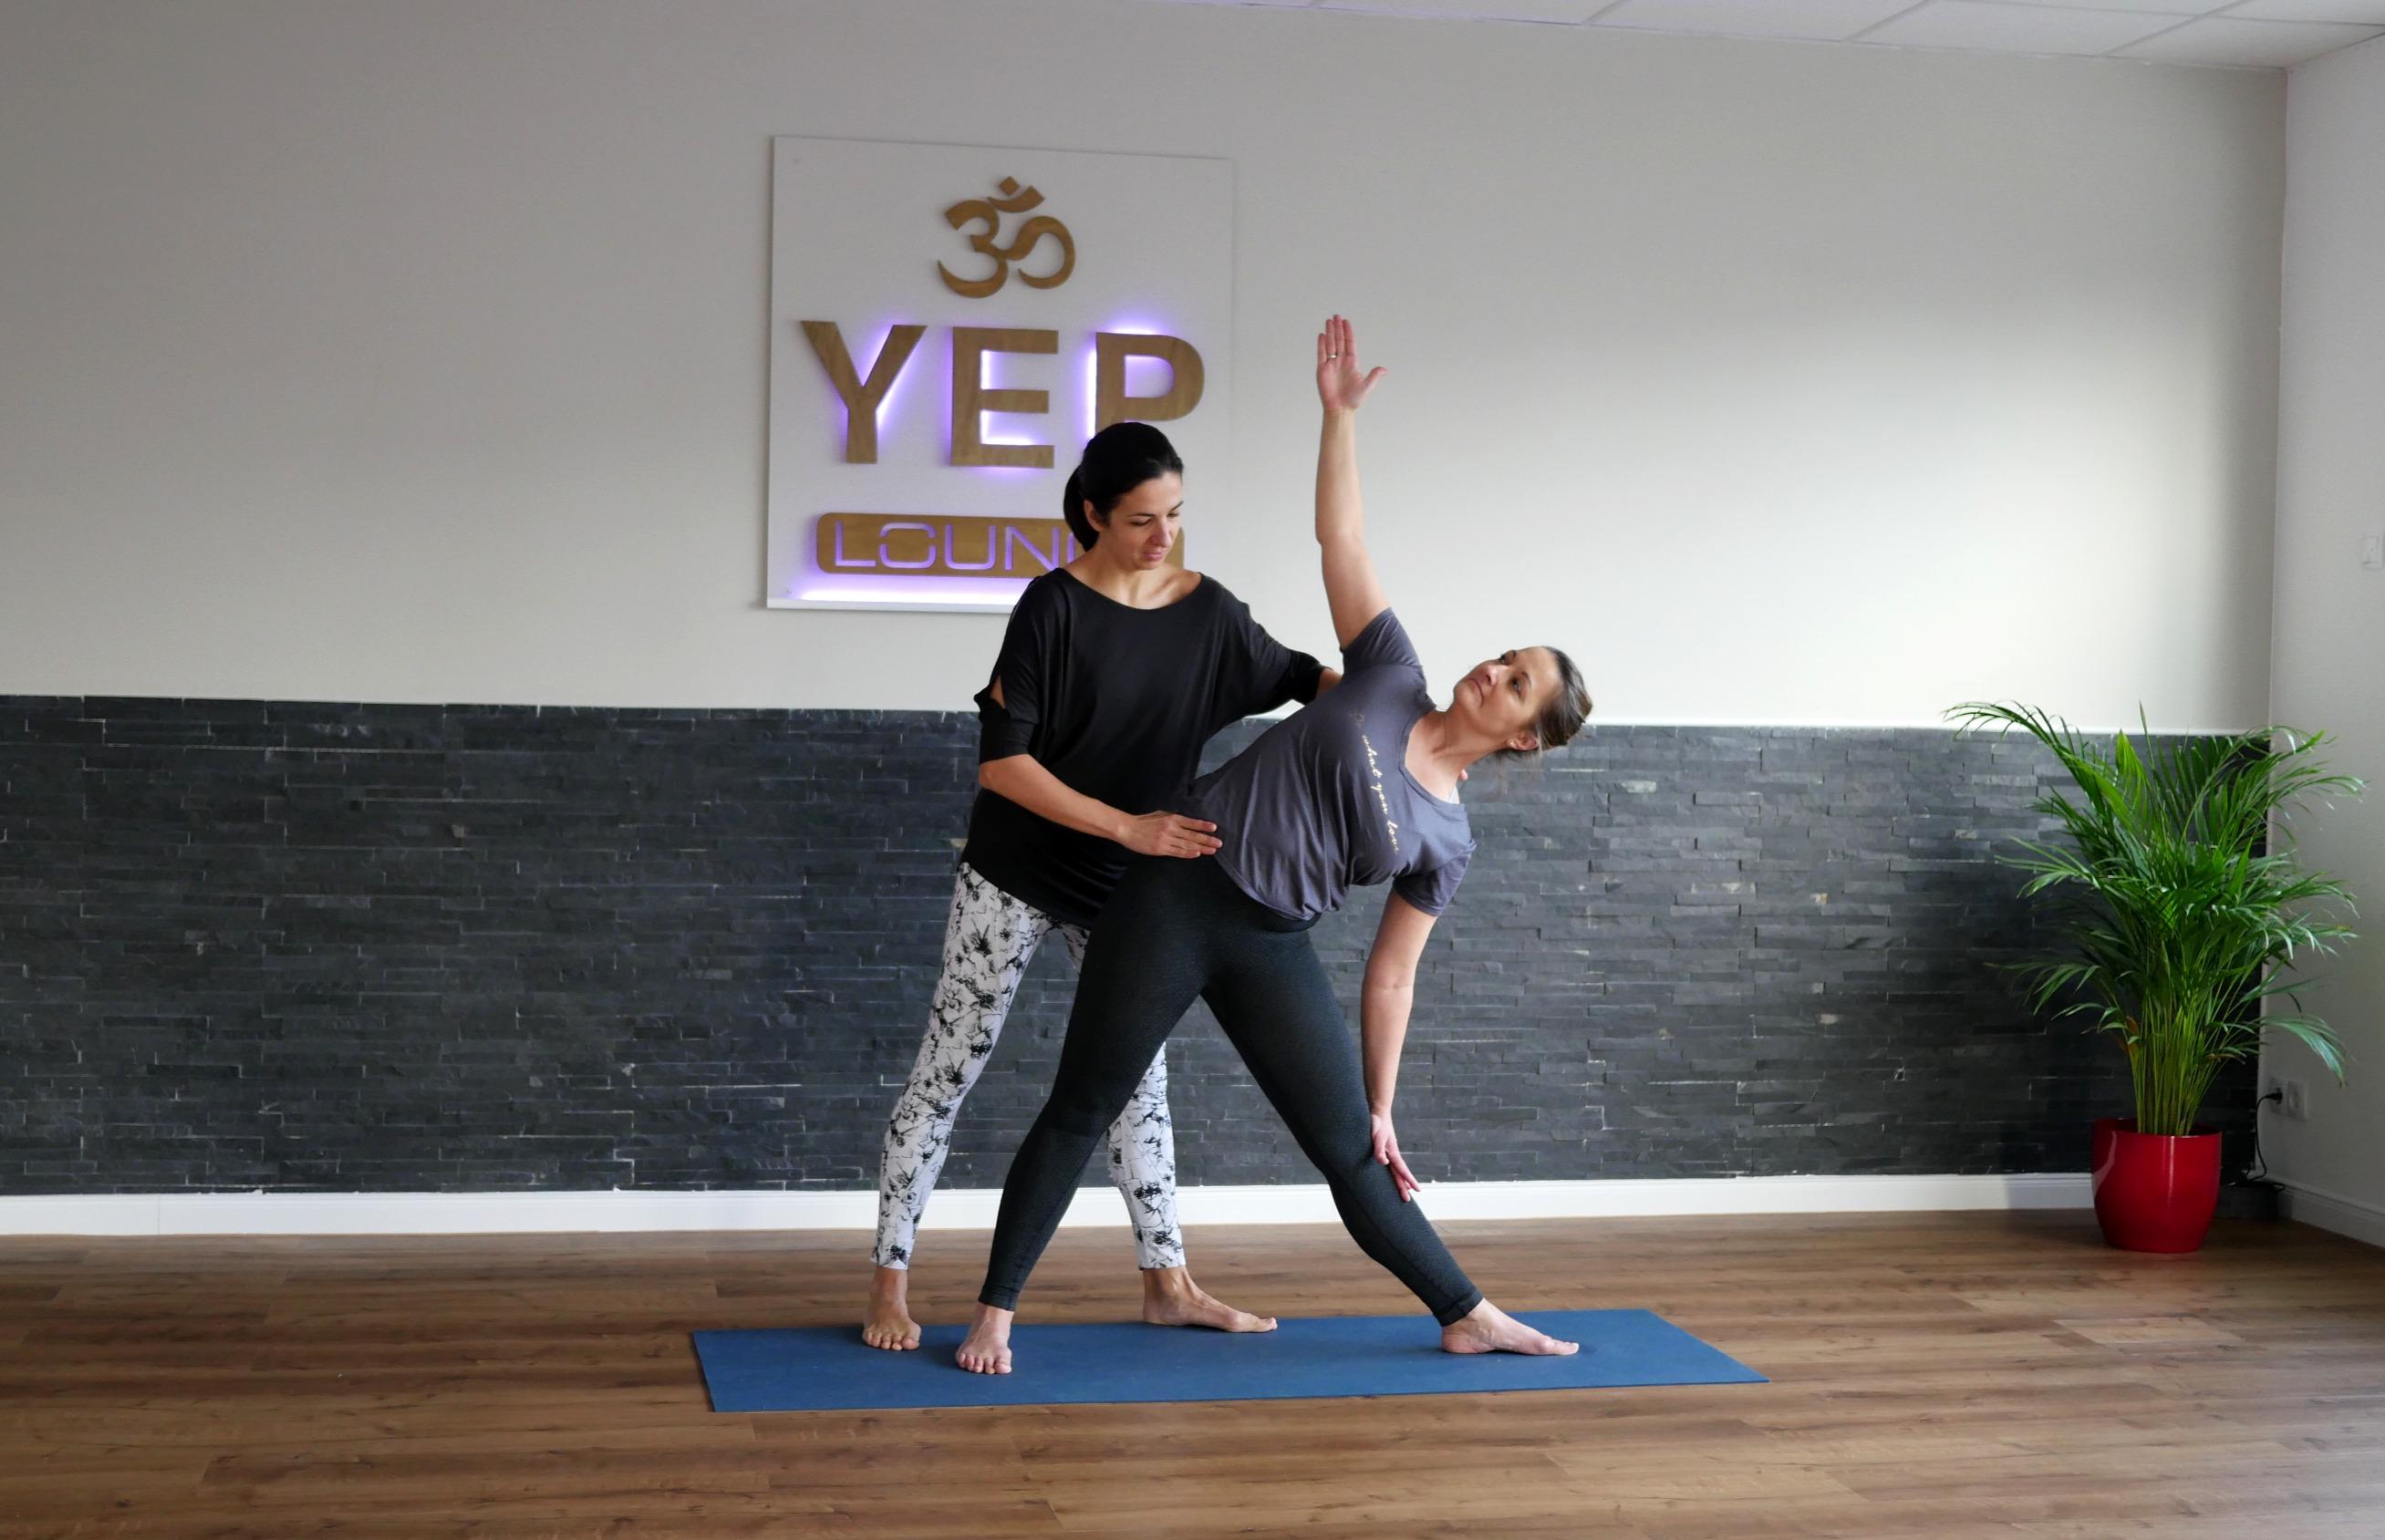 Personal Yoga in der YEP Lounge